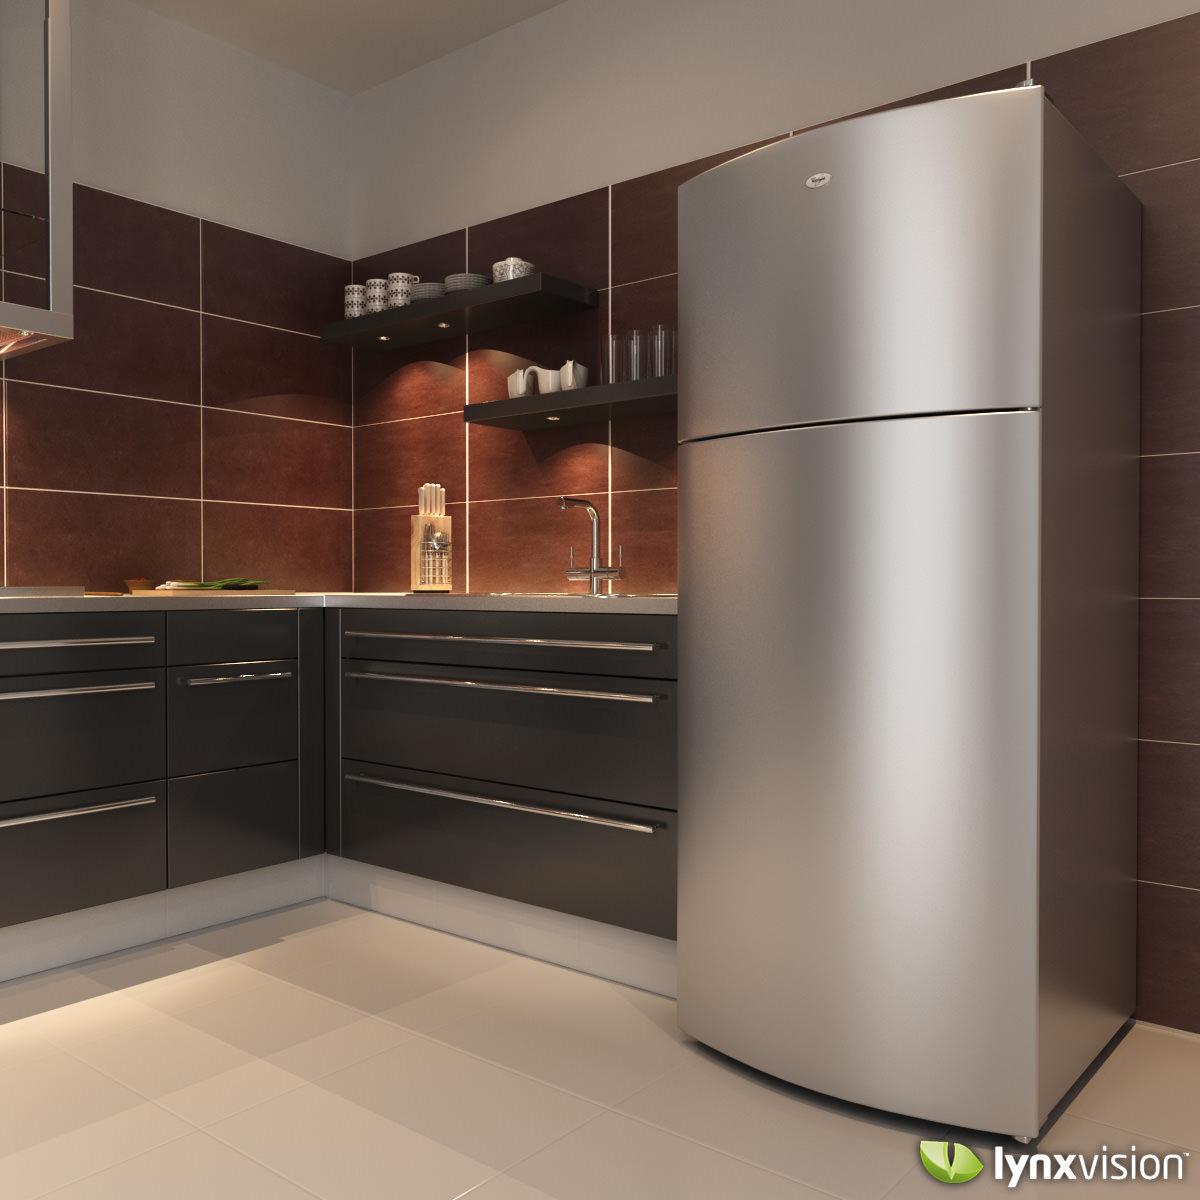 whirlpool refrigerator top freezer. whirlpool top freezer refrigerator 3d model max obj fbx 2 f